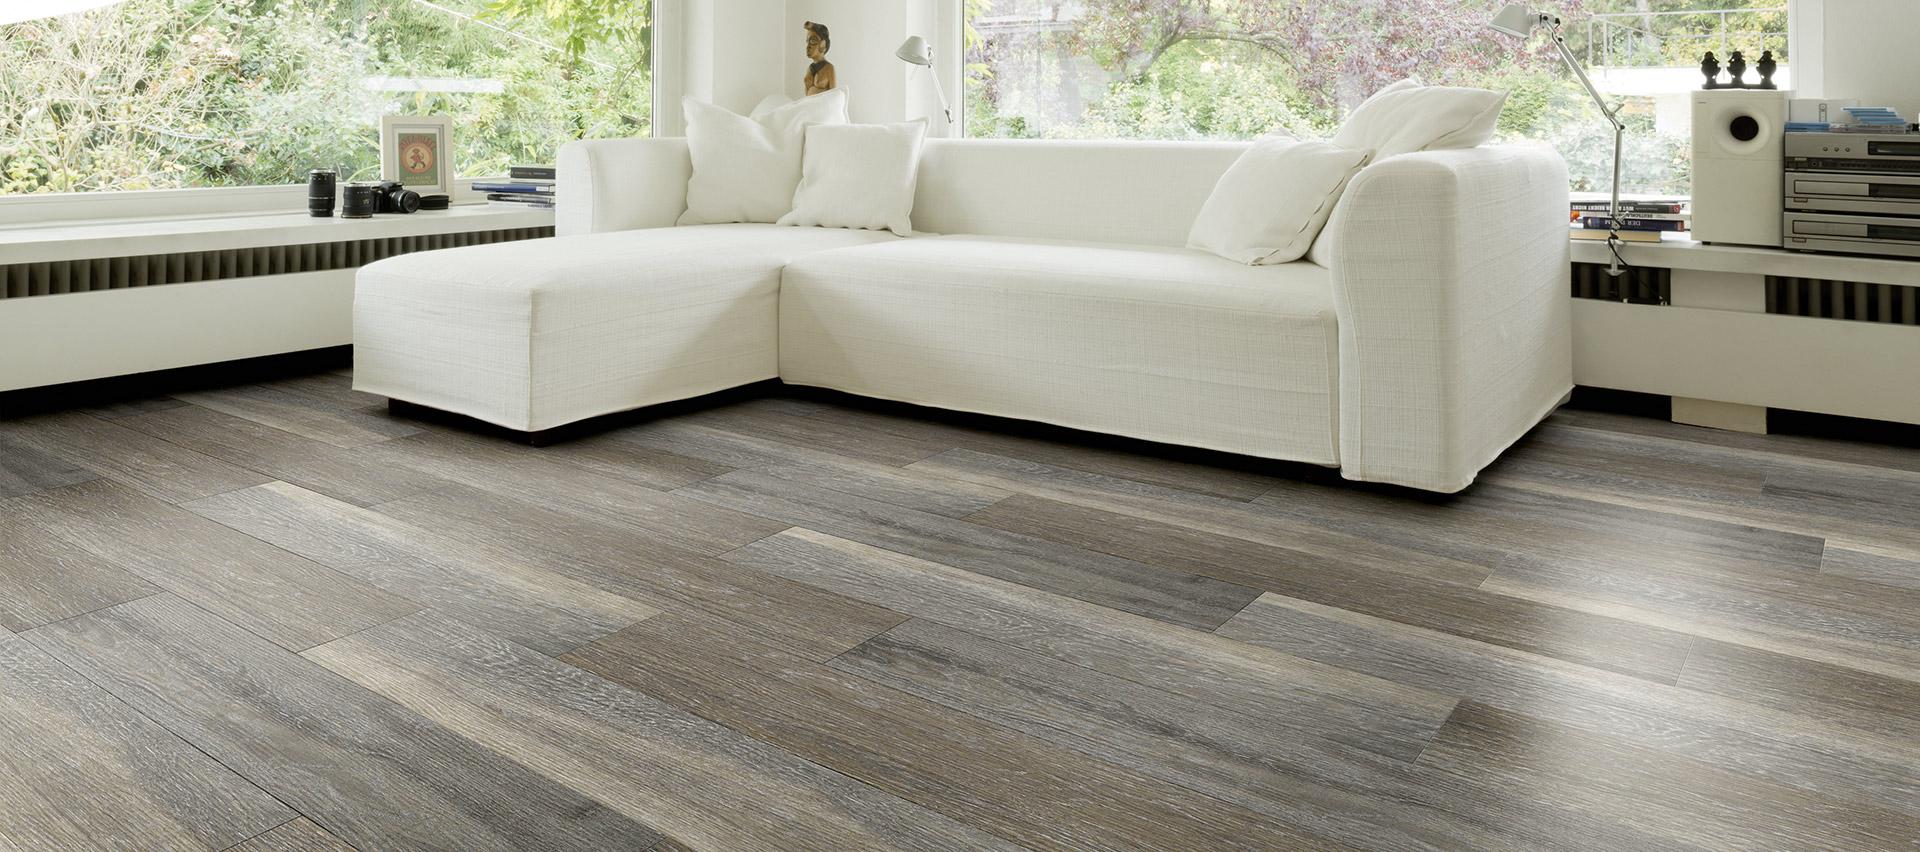 vinylboden gro e auswahl bei holz hauff. Black Bedroom Furniture Sets. Home Design Ideas